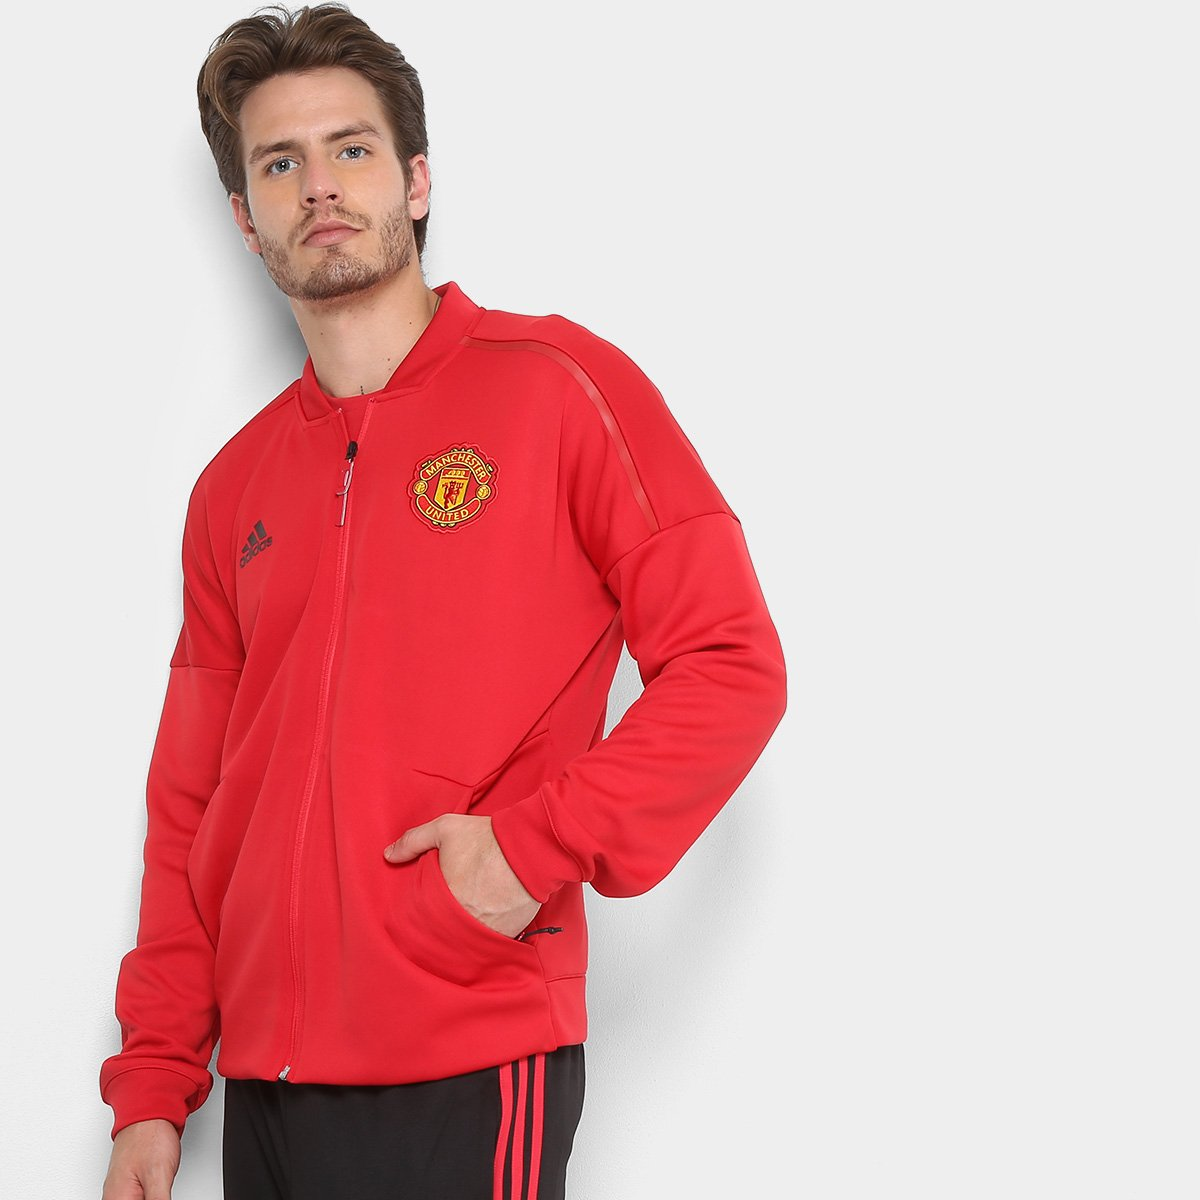 acf5bfc67 Jaqueta Manchester United Adidas Masculina - Compre Agora